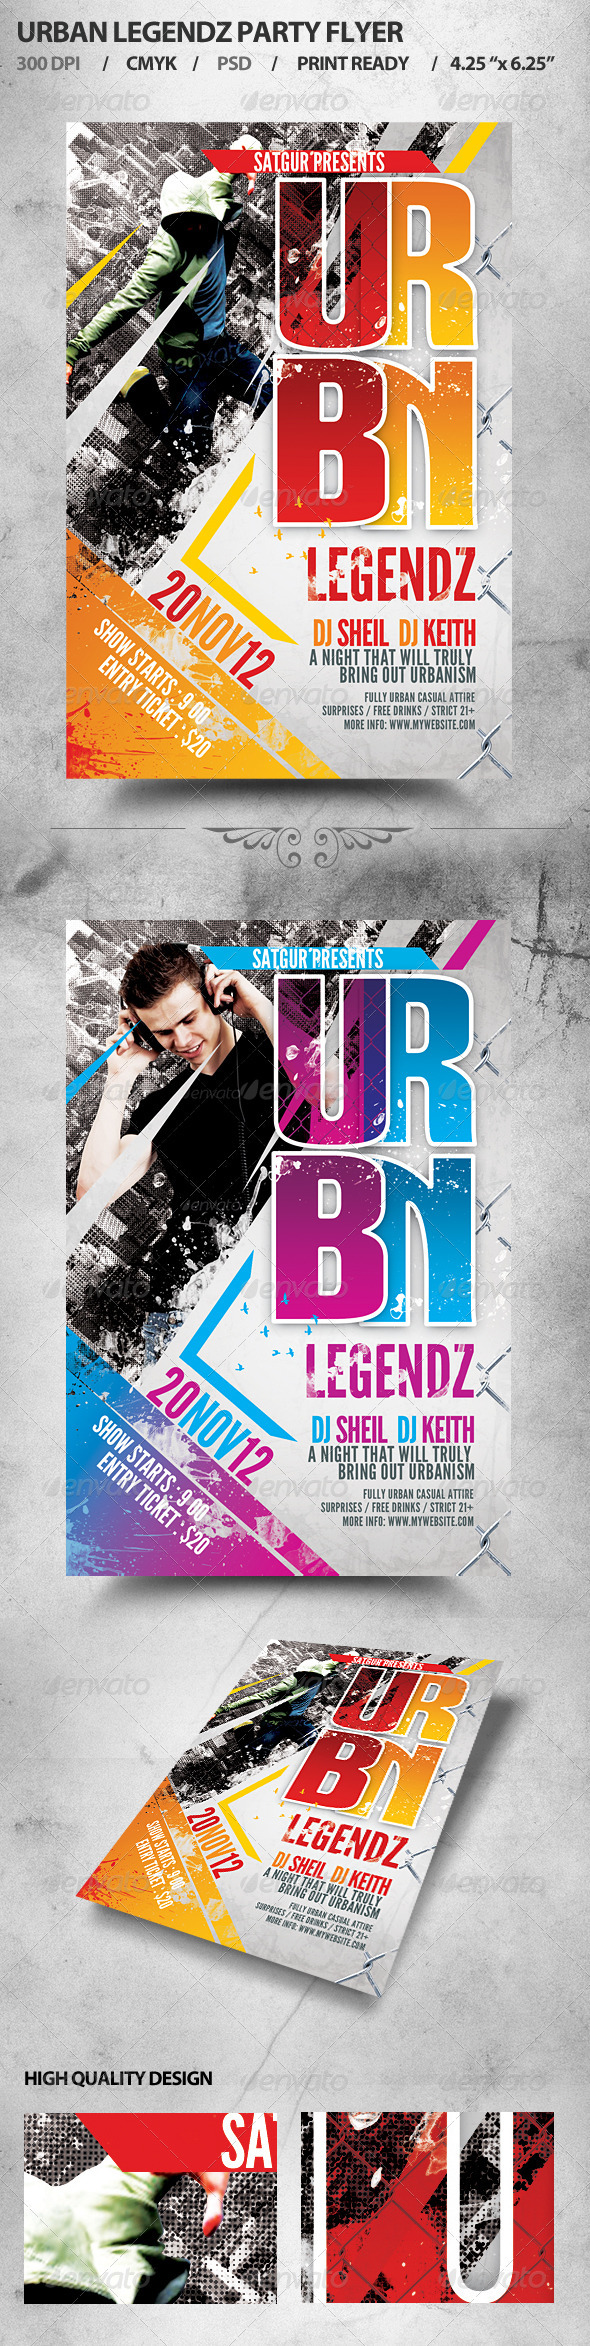 Urban Legendz Party Flyer - Clubs & Parties Events